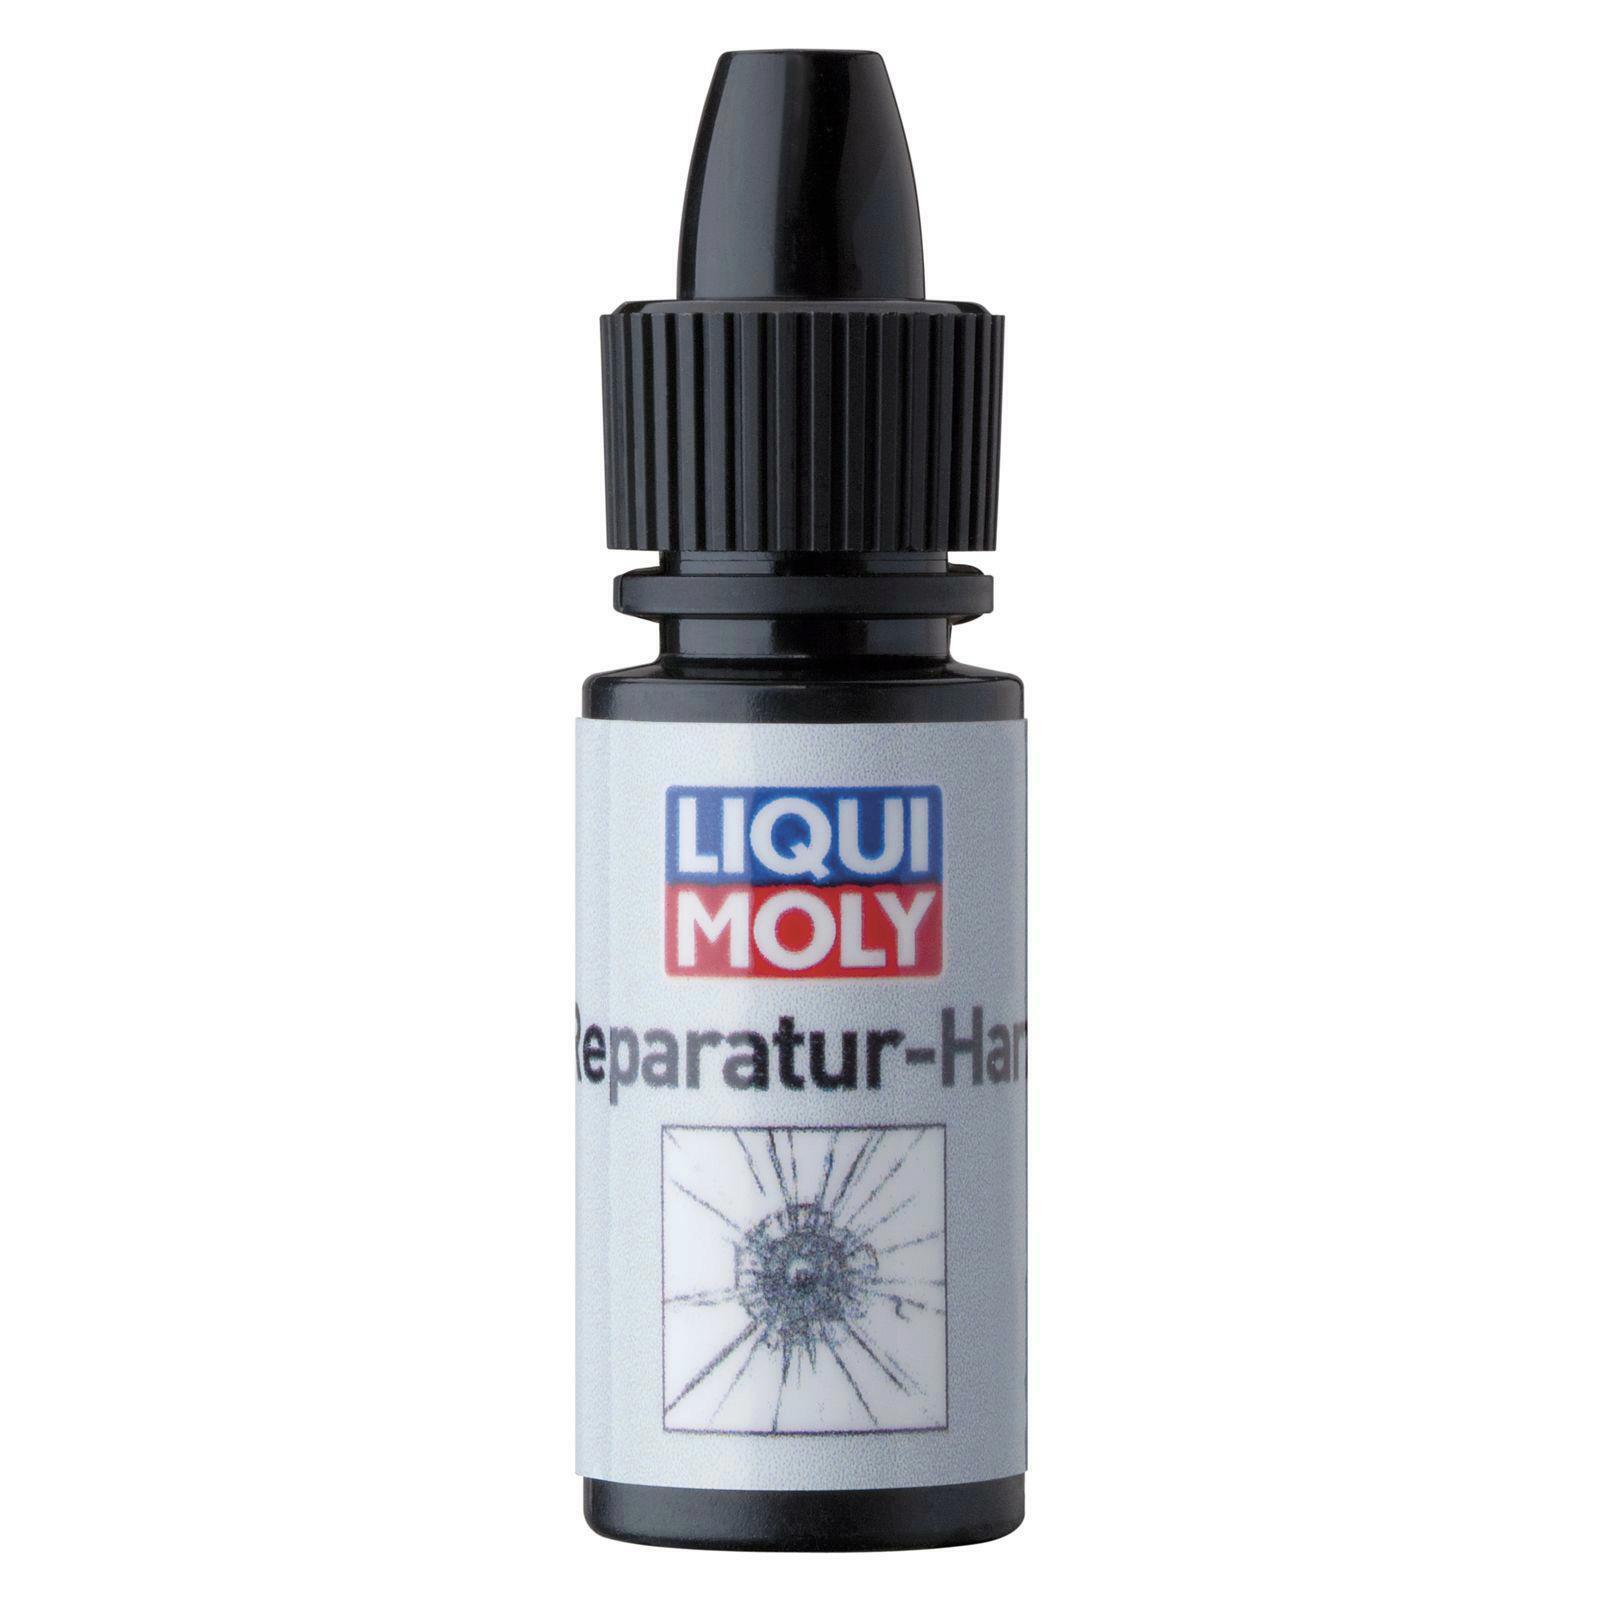 Liqui Moly Reparatur-Harz mit Injector